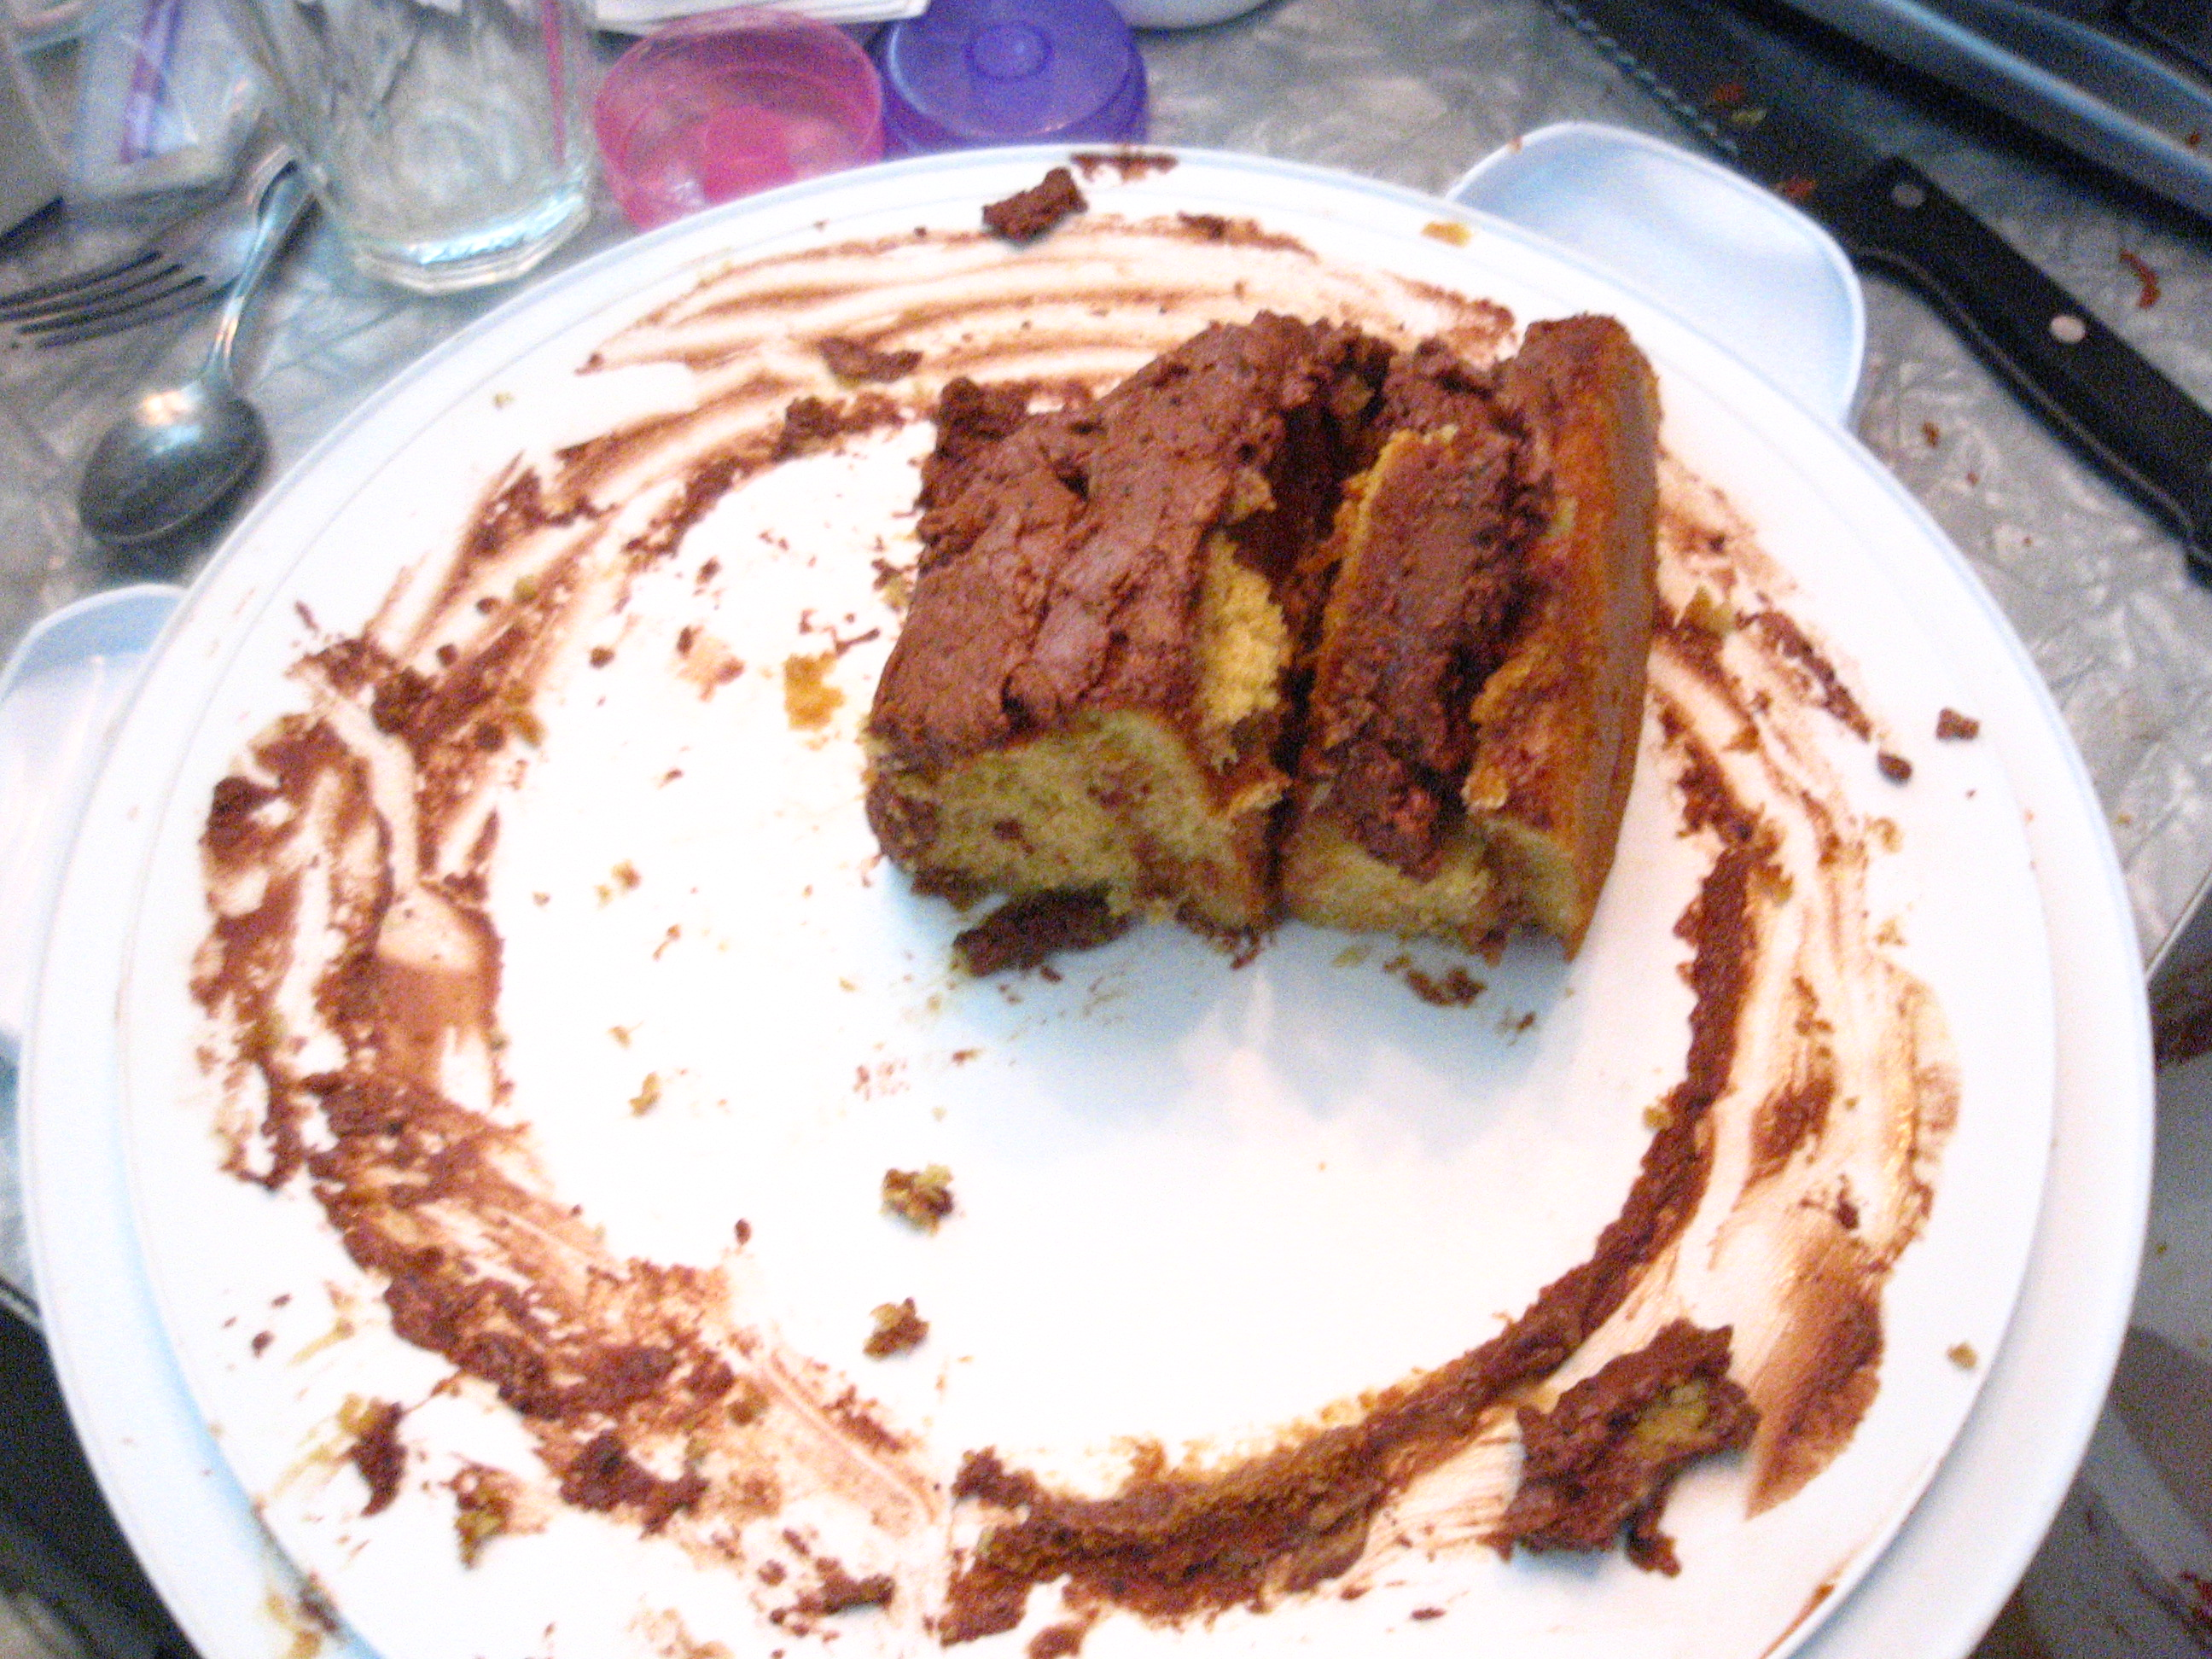 PB Cake aftermath